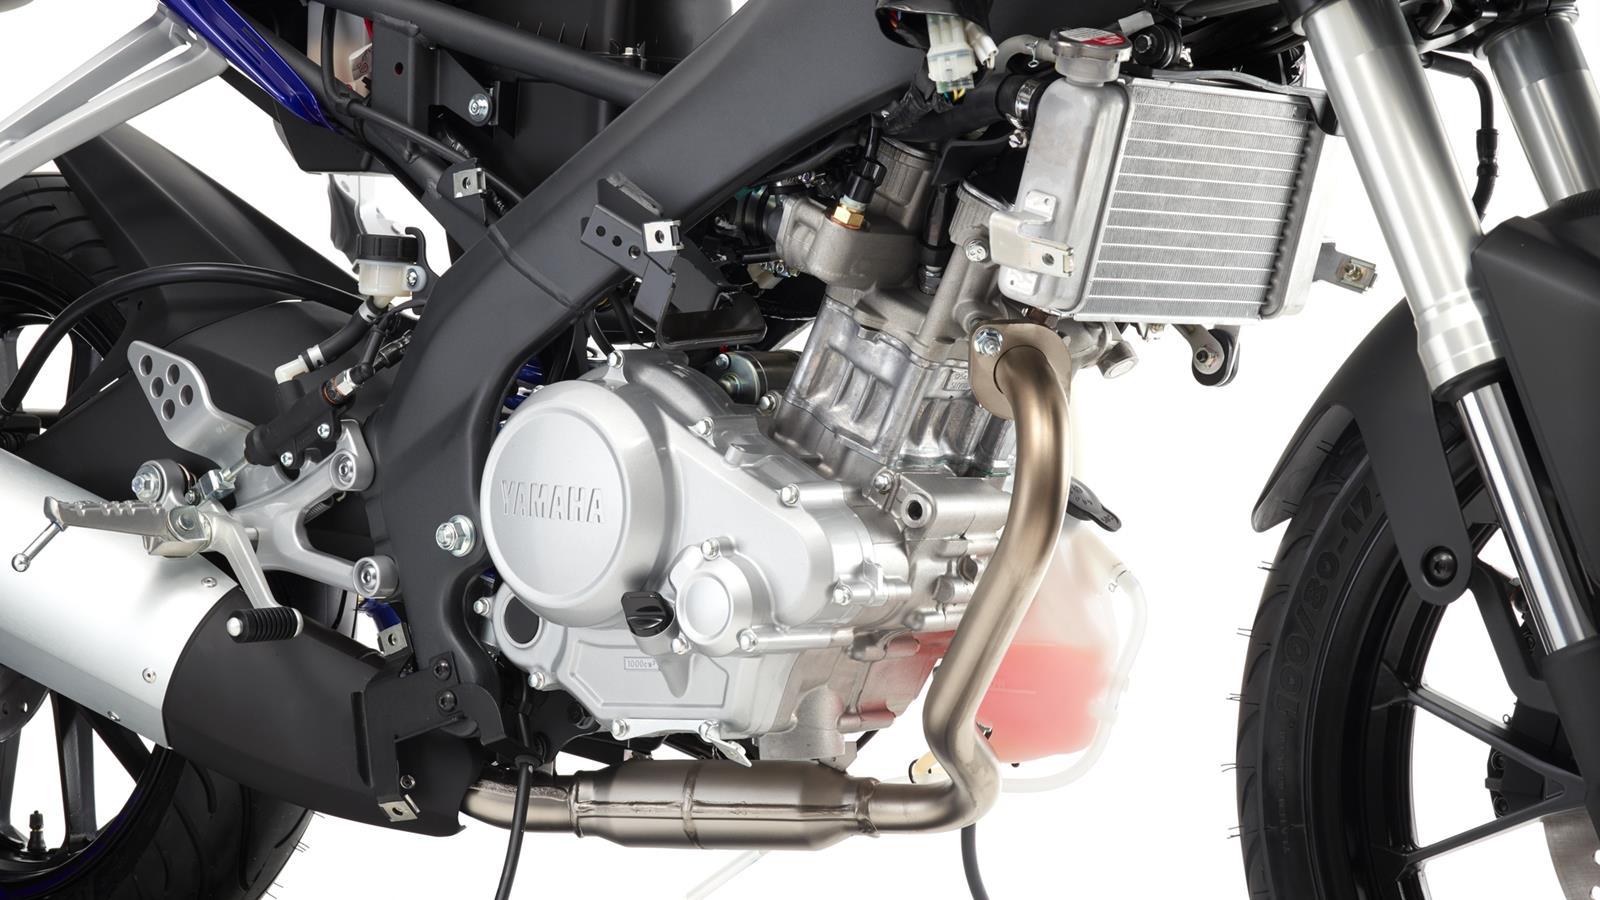 Yamaha S 2015 Yzf R125 Illustrates Massive Effort On Small